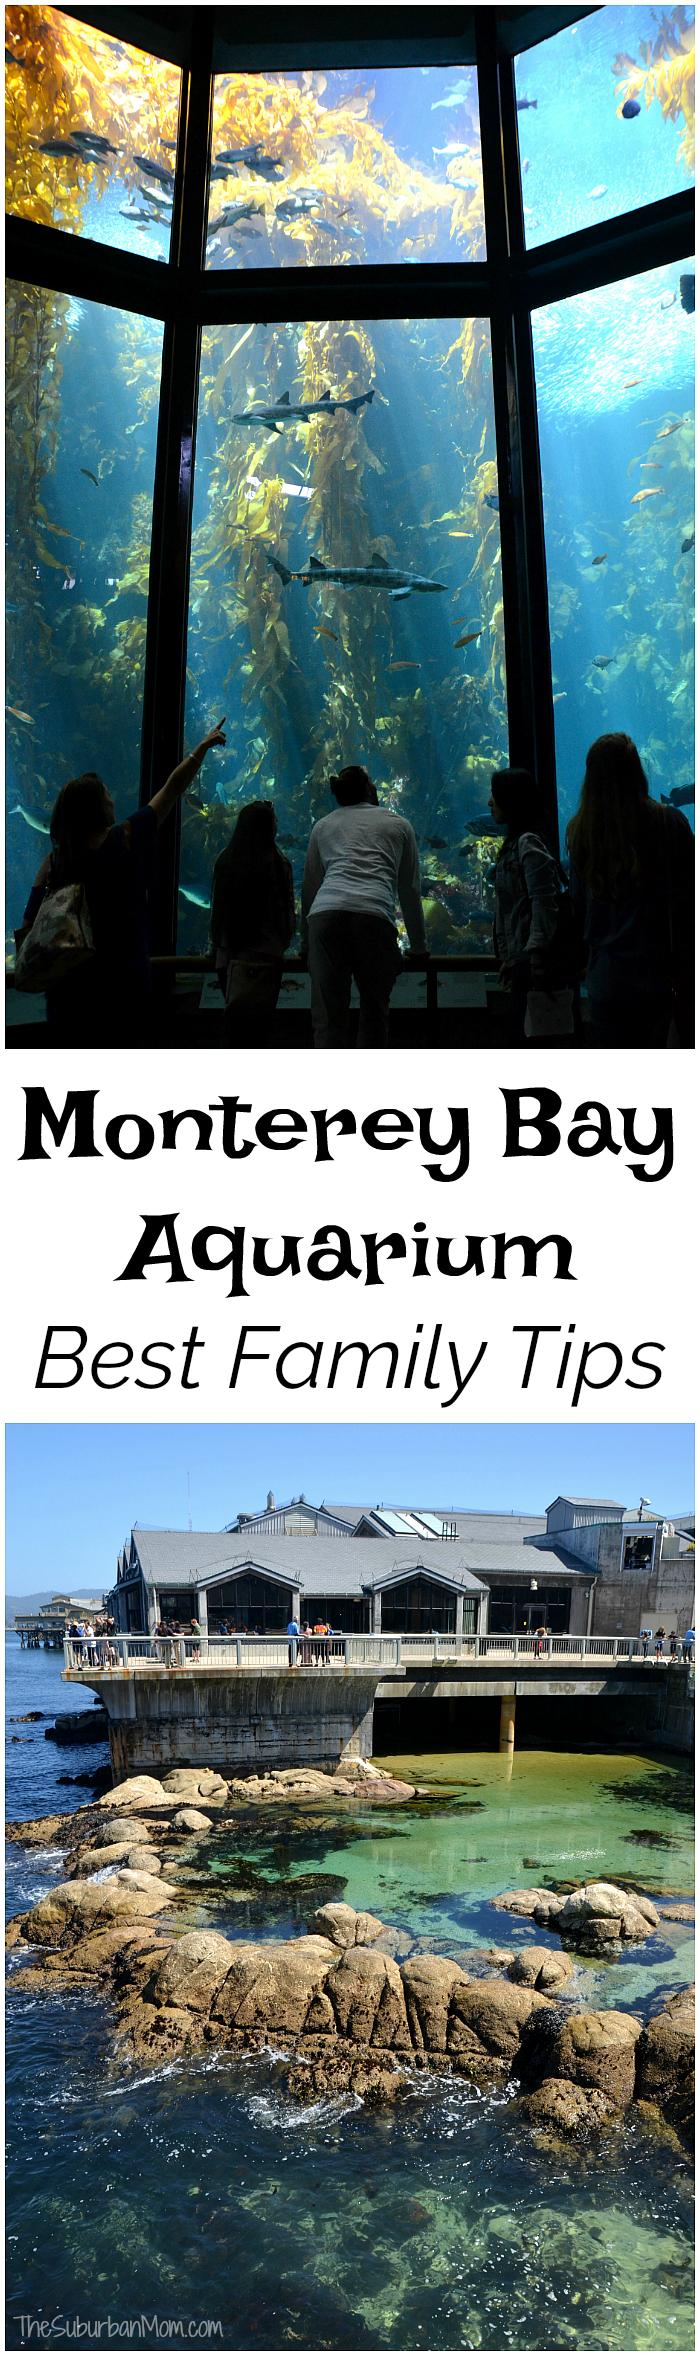 Best Family Tips Monterey Bay Aquarium The Suburban Mom